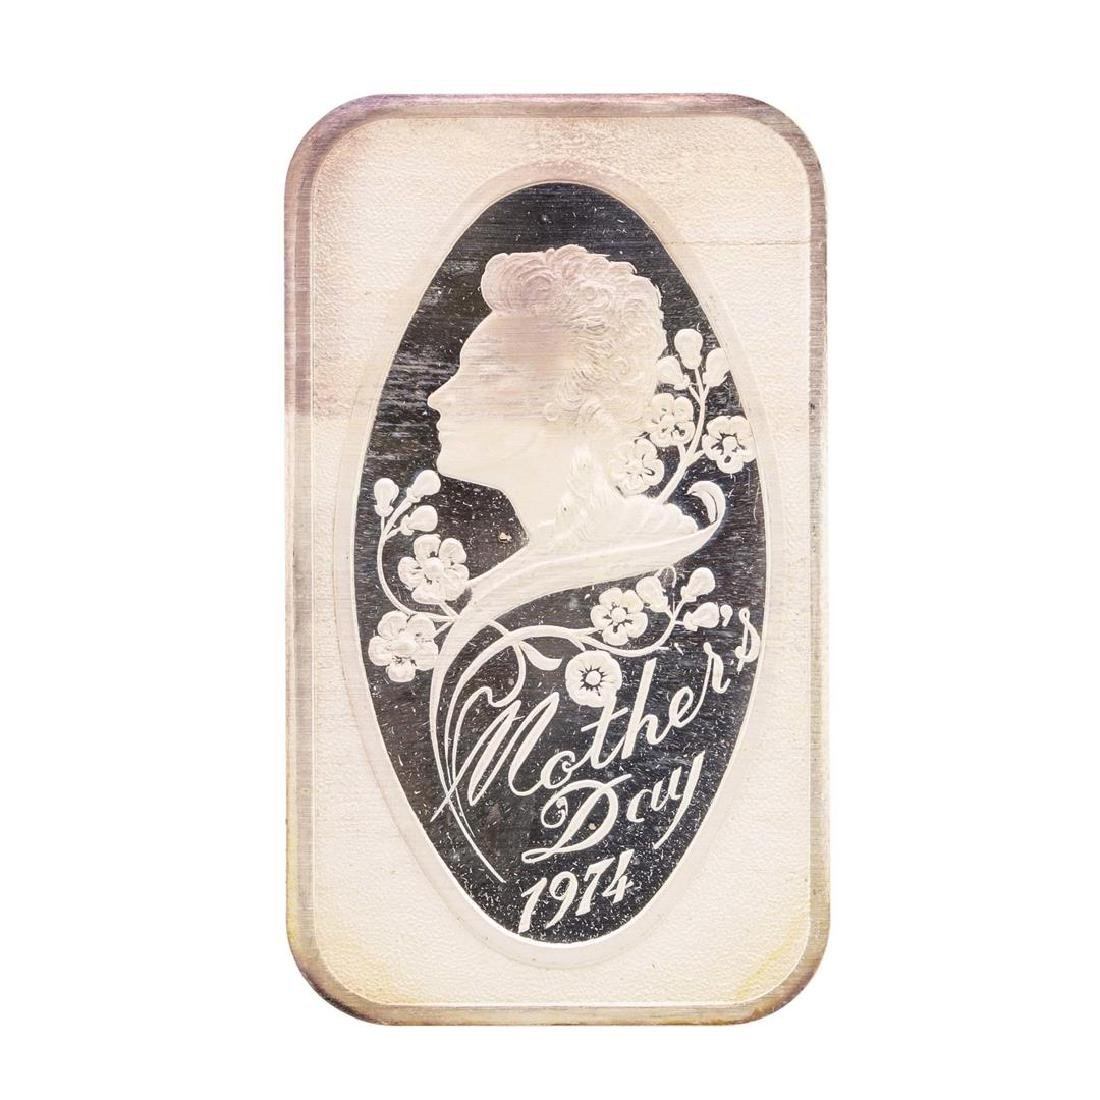 1974 Happy Mothers Day 1 oz .999 Fine Silver Art Bar